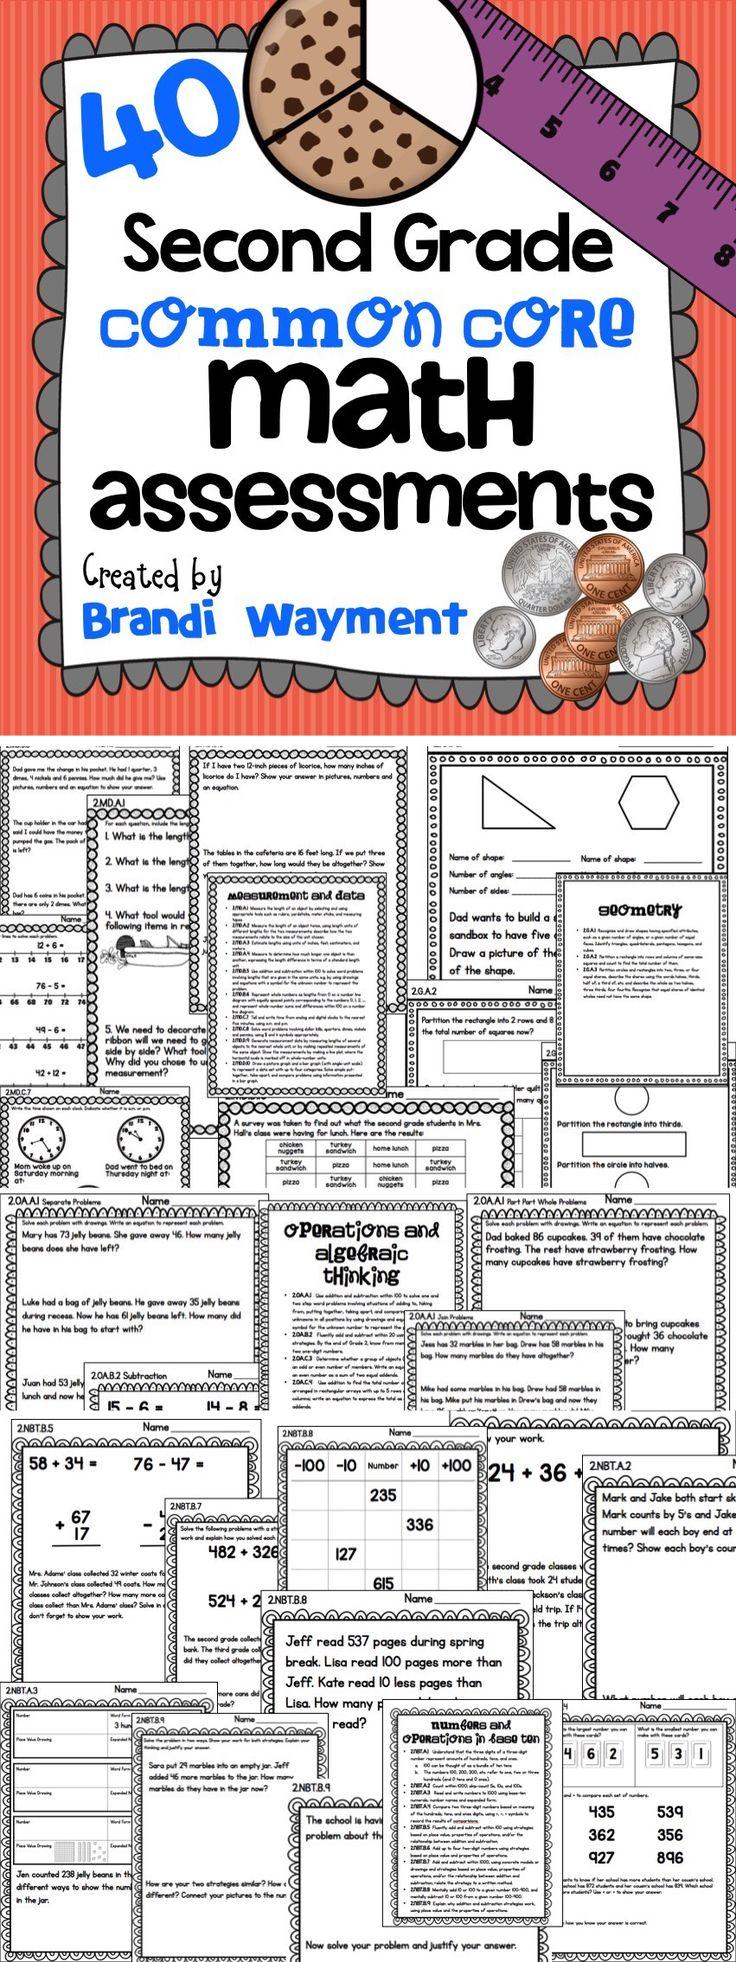 40 Second Grade Common Core Math Assessments